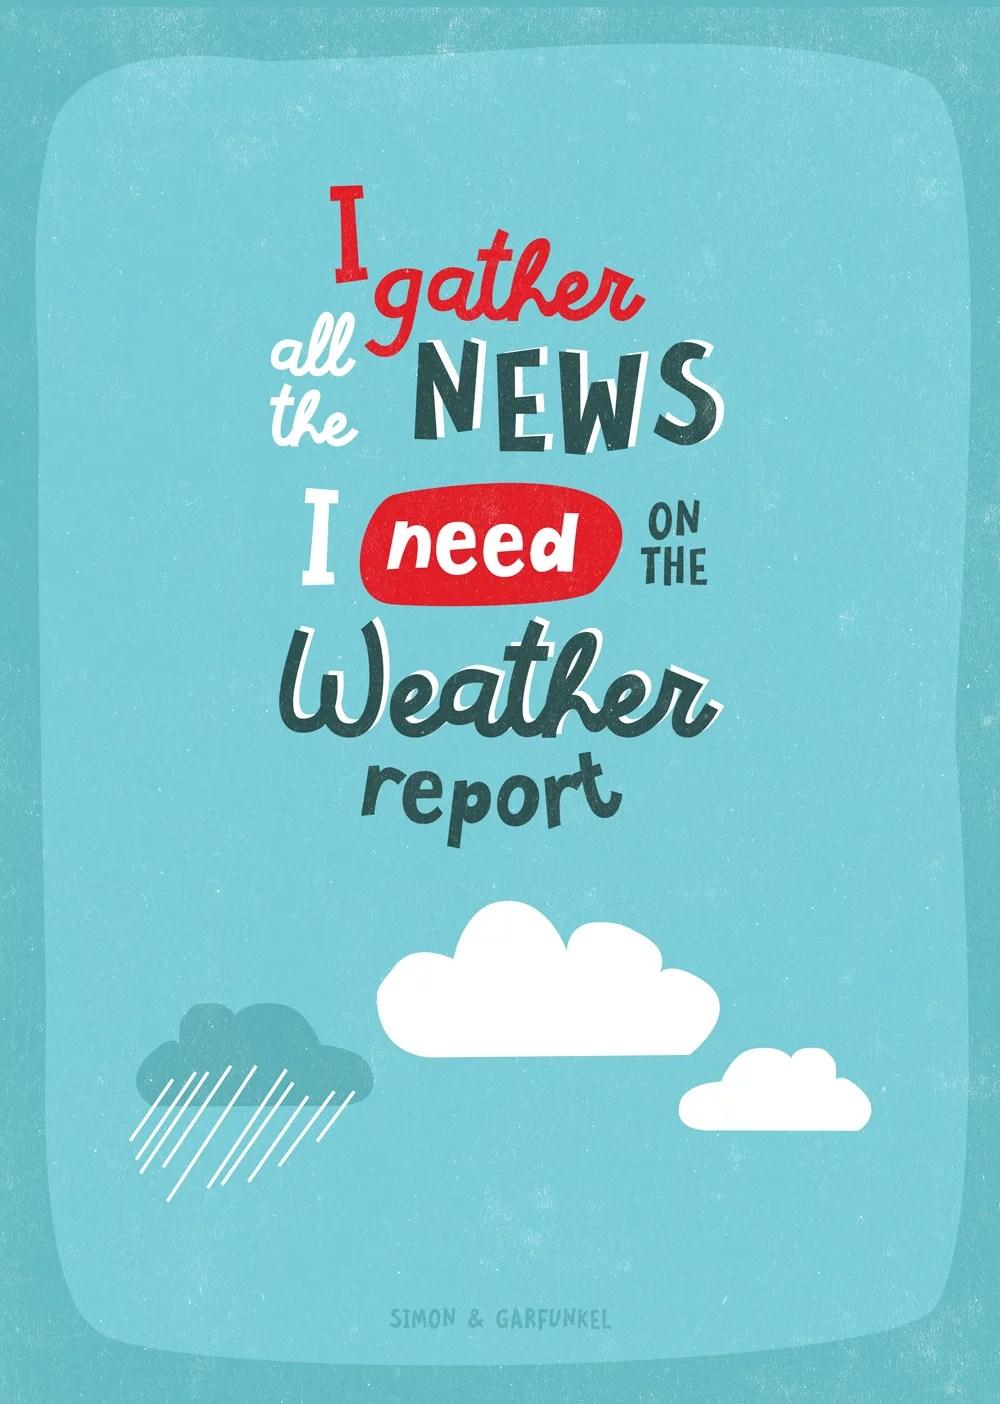 weatherreport